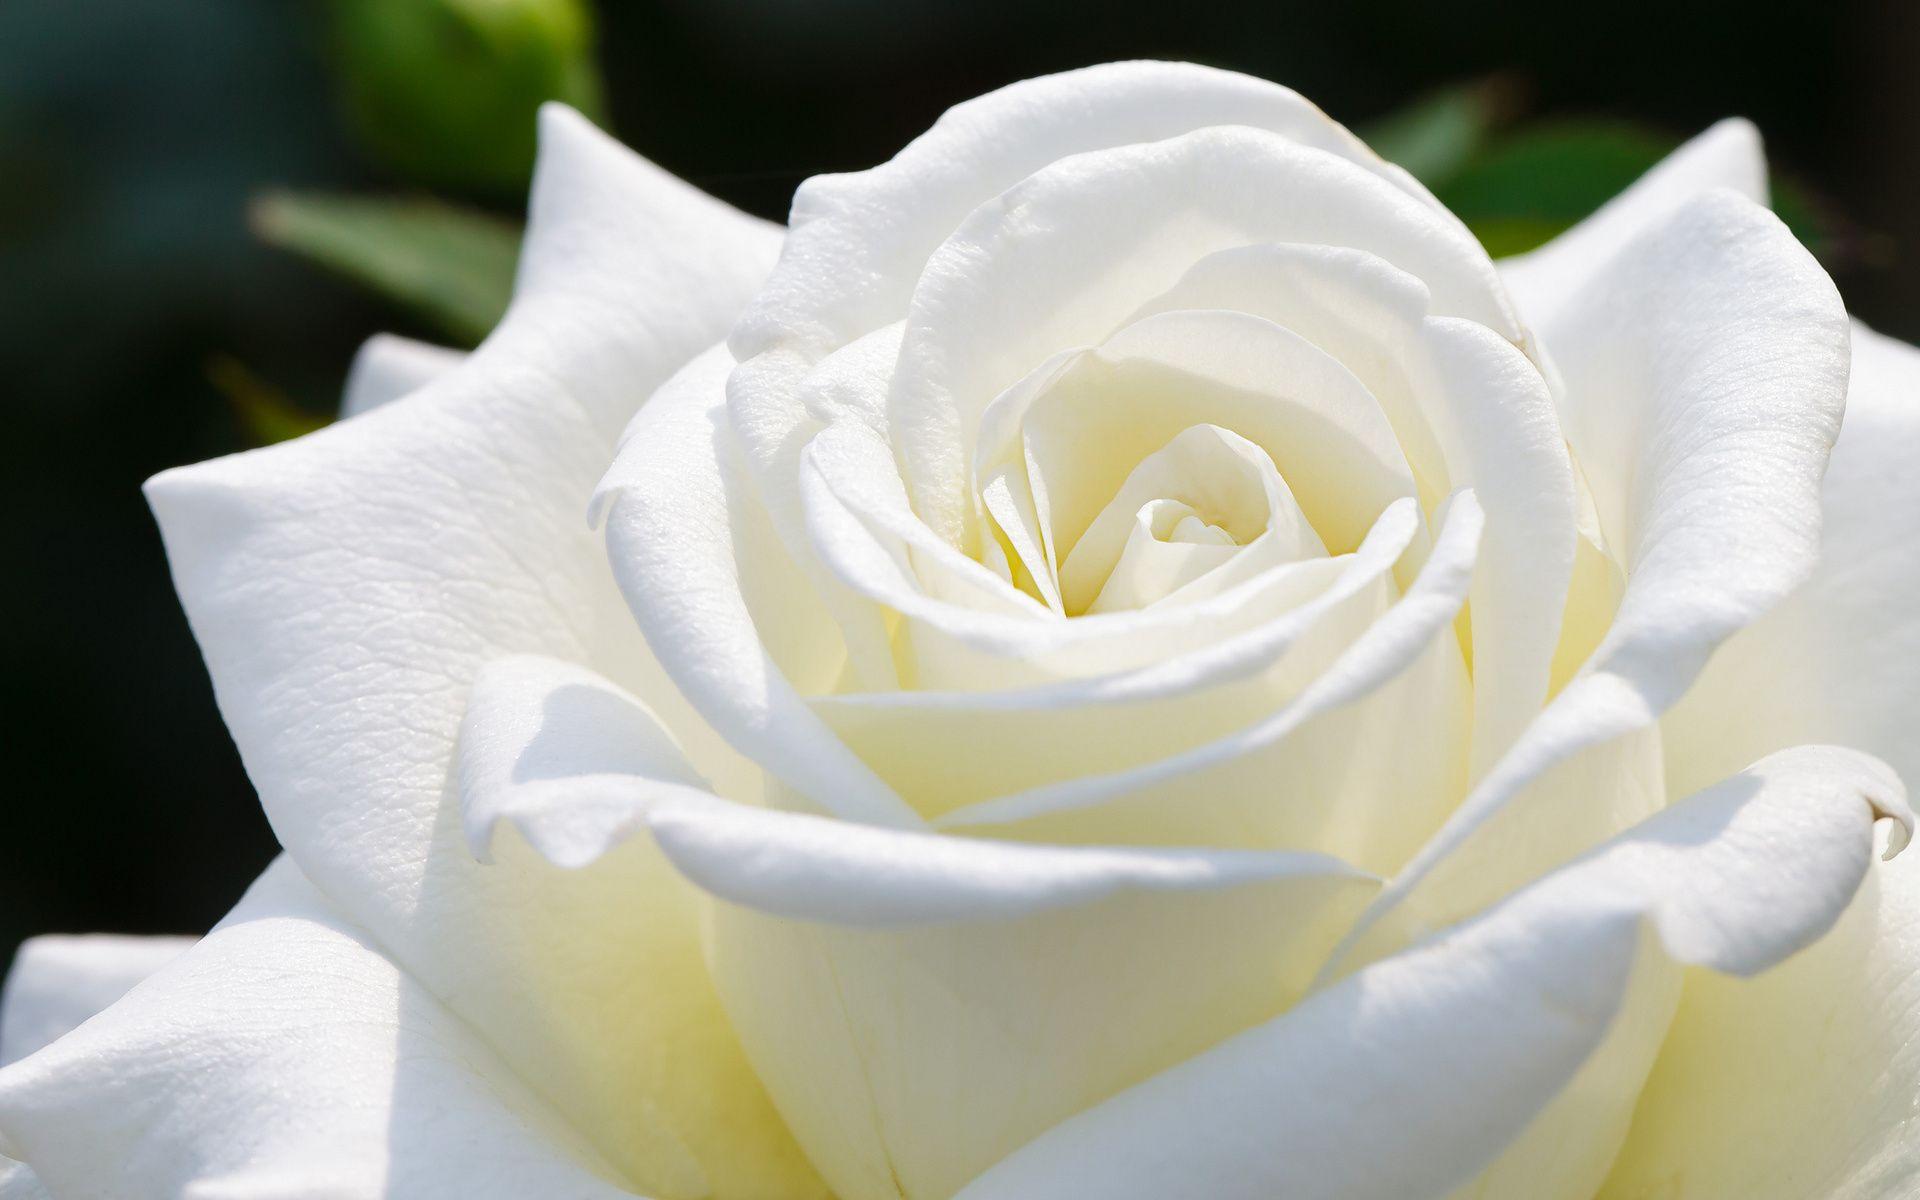 Beautiful White Rose HD Wallpapers   HD Wallpapers Fit ... White Rose Flower Garden Wallpaper